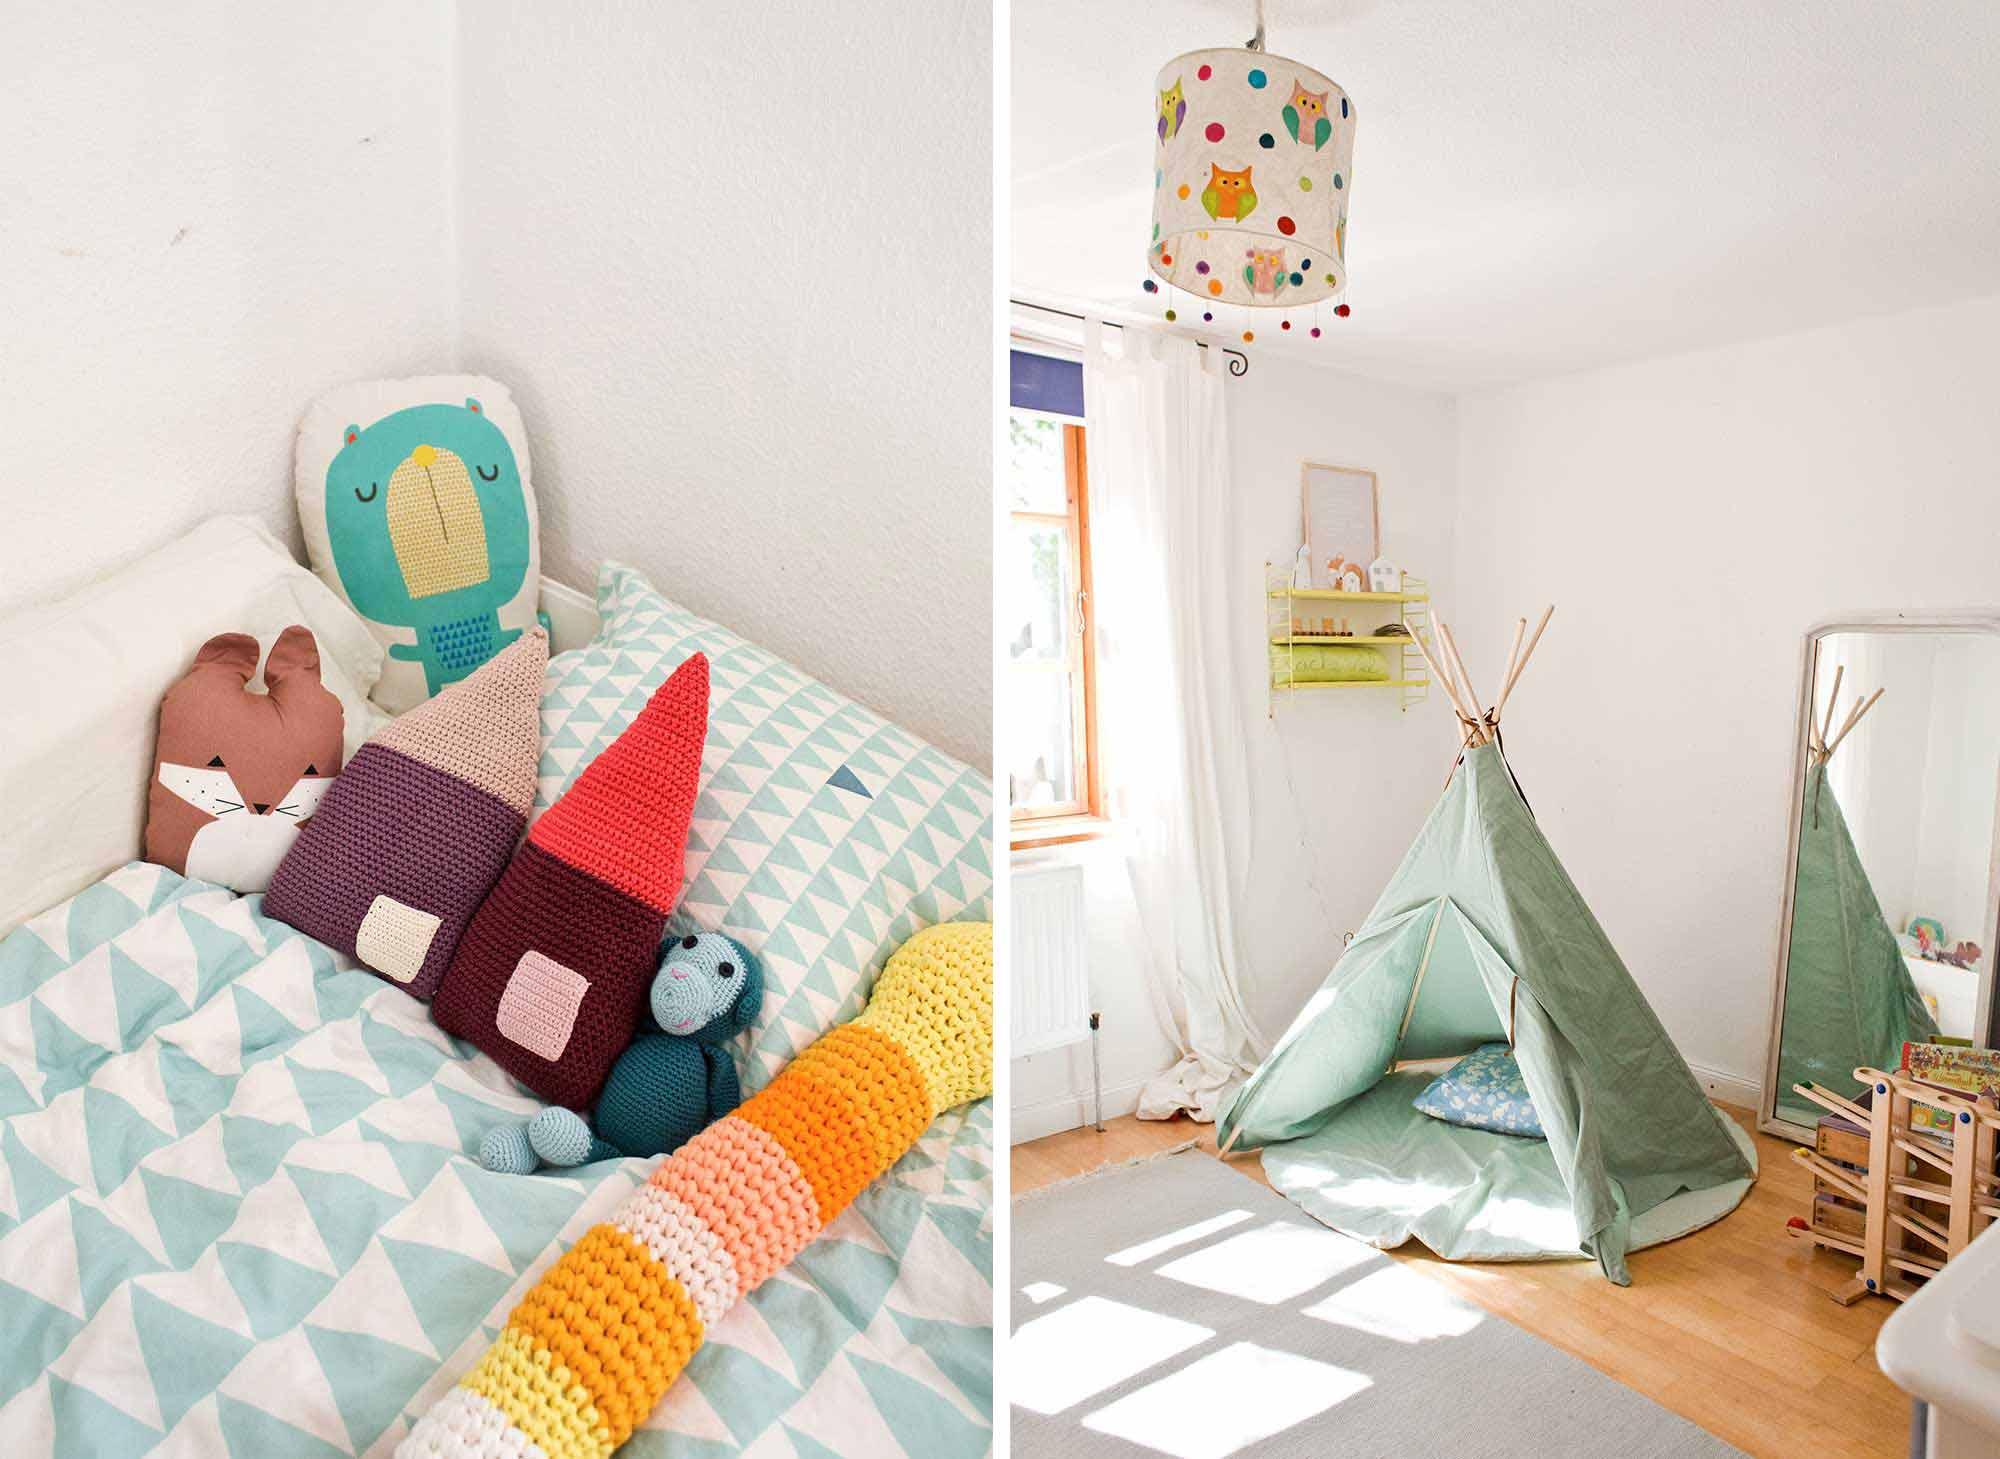 homestory-Kinderzimmer-bunt